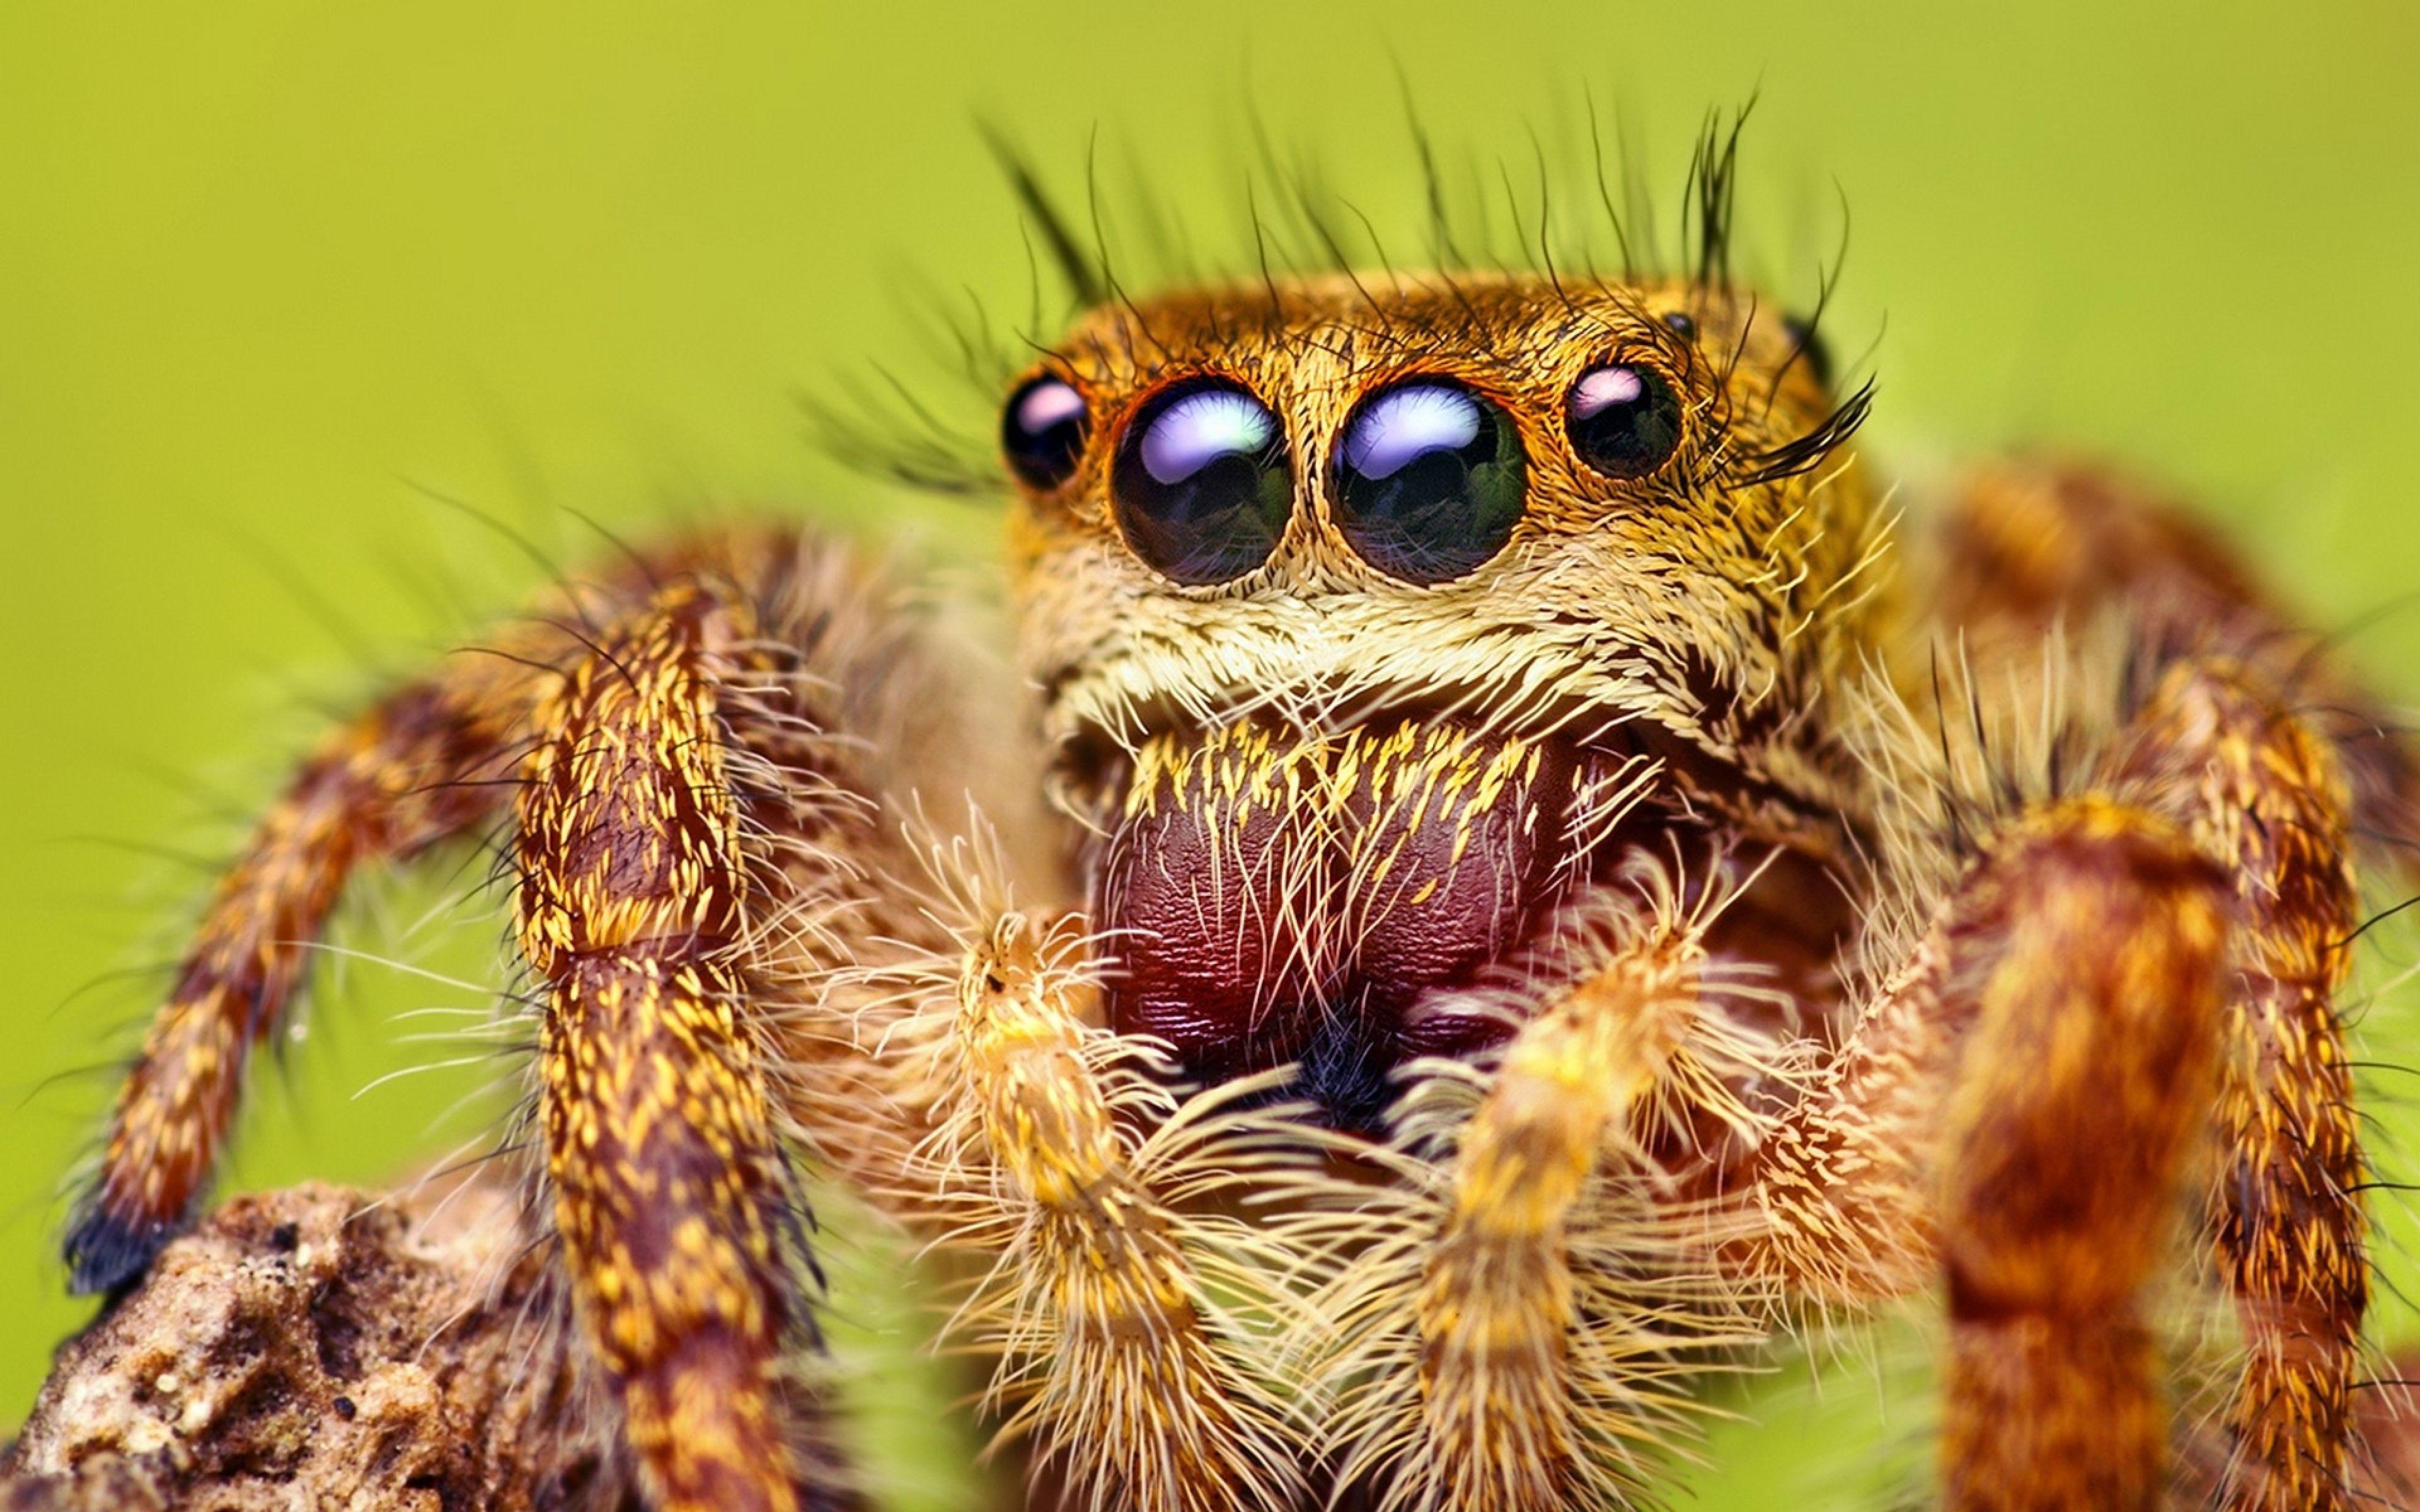 Download Wallpaper 3840x2400 Spider, Legs, Hairy, Eyes Ultra HD 4K .